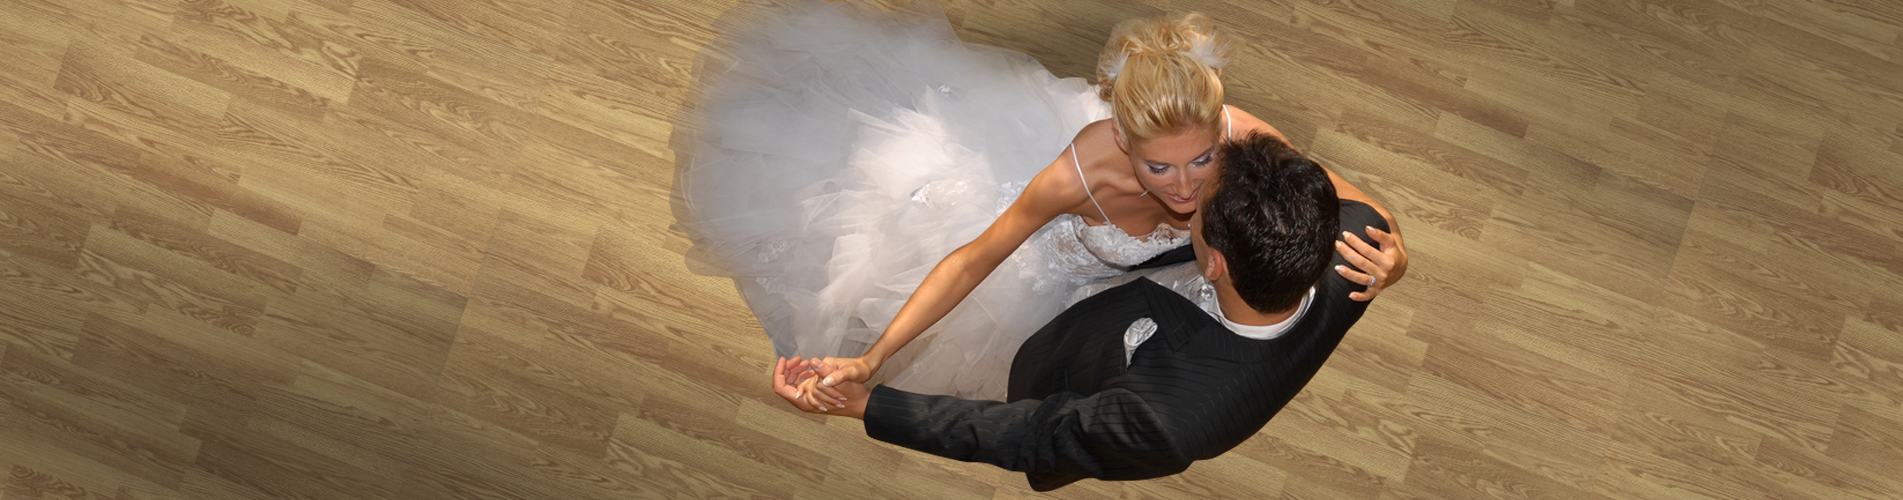 Les Stages Valse Mariage Dancenter.